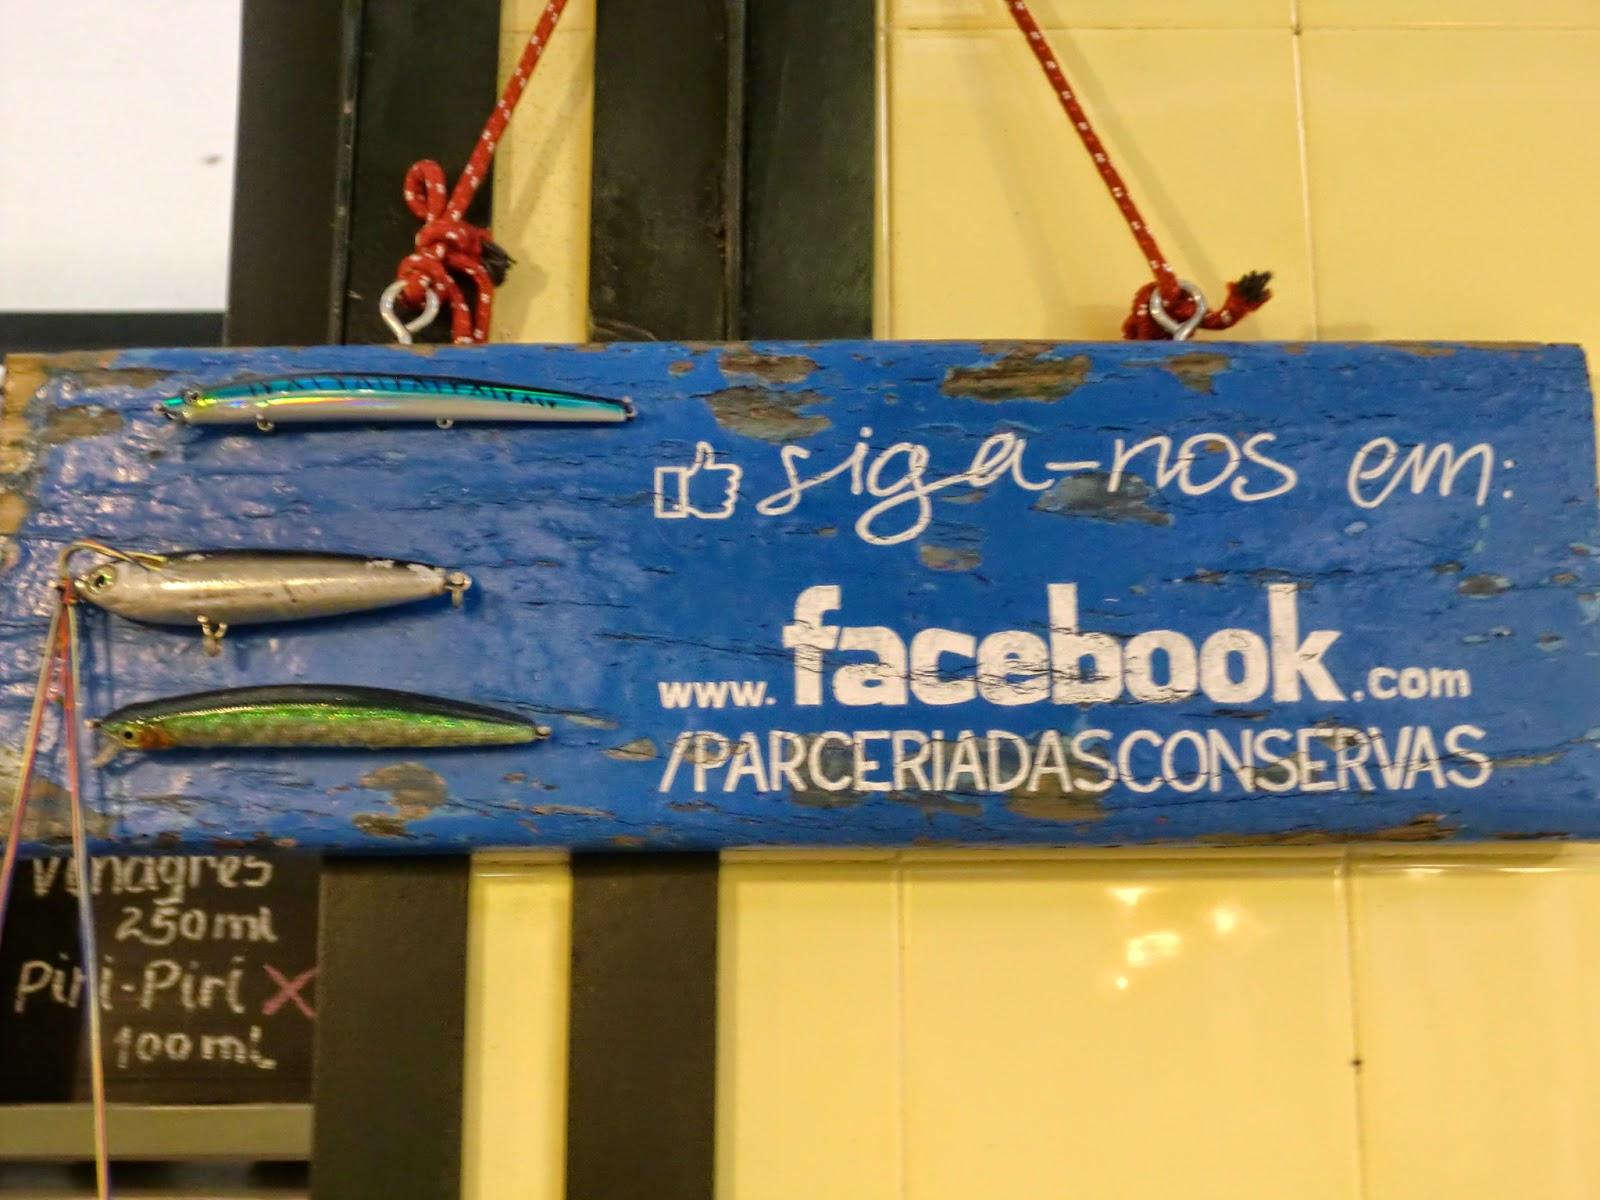 https://www.facebook.com/parceriadasconservas?fref=ts